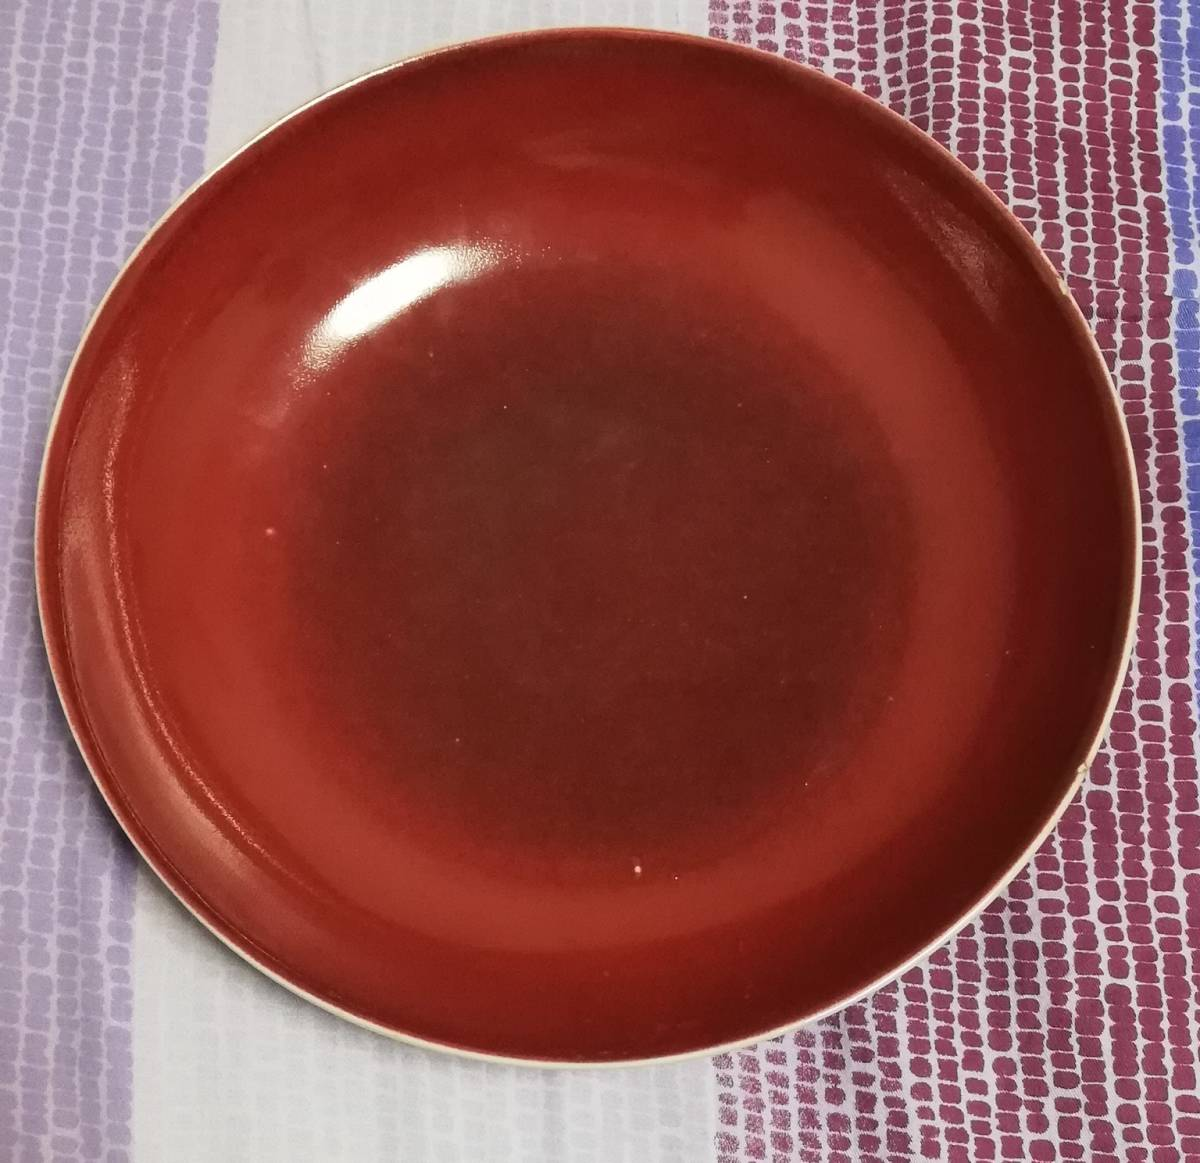 官窯 大清乾隆年製銘あり 祭紅 皿 中国 時代保証_画像7